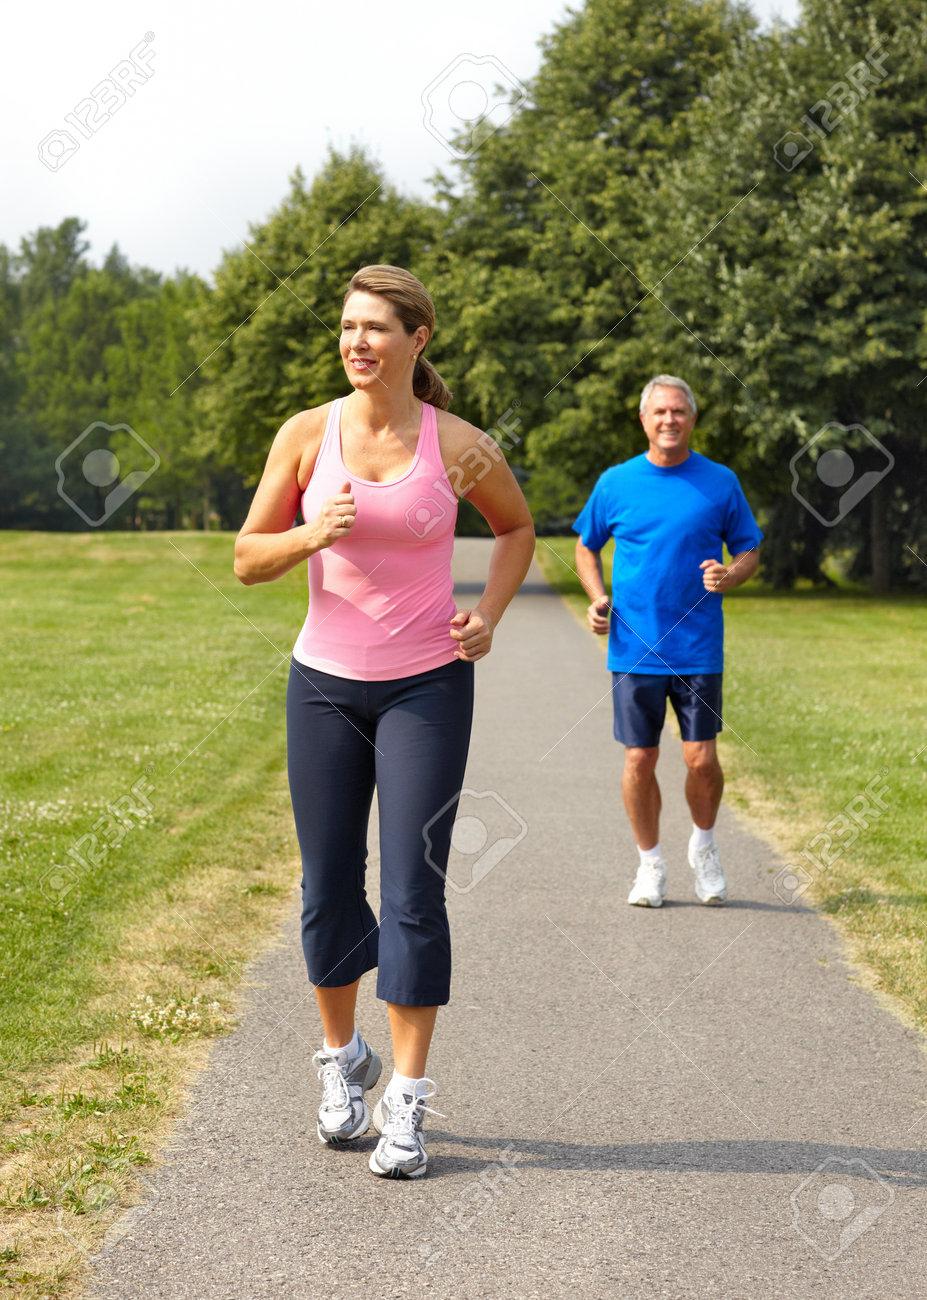 Happy elderly seniors couple jogging in park Stock Photo - 7362922